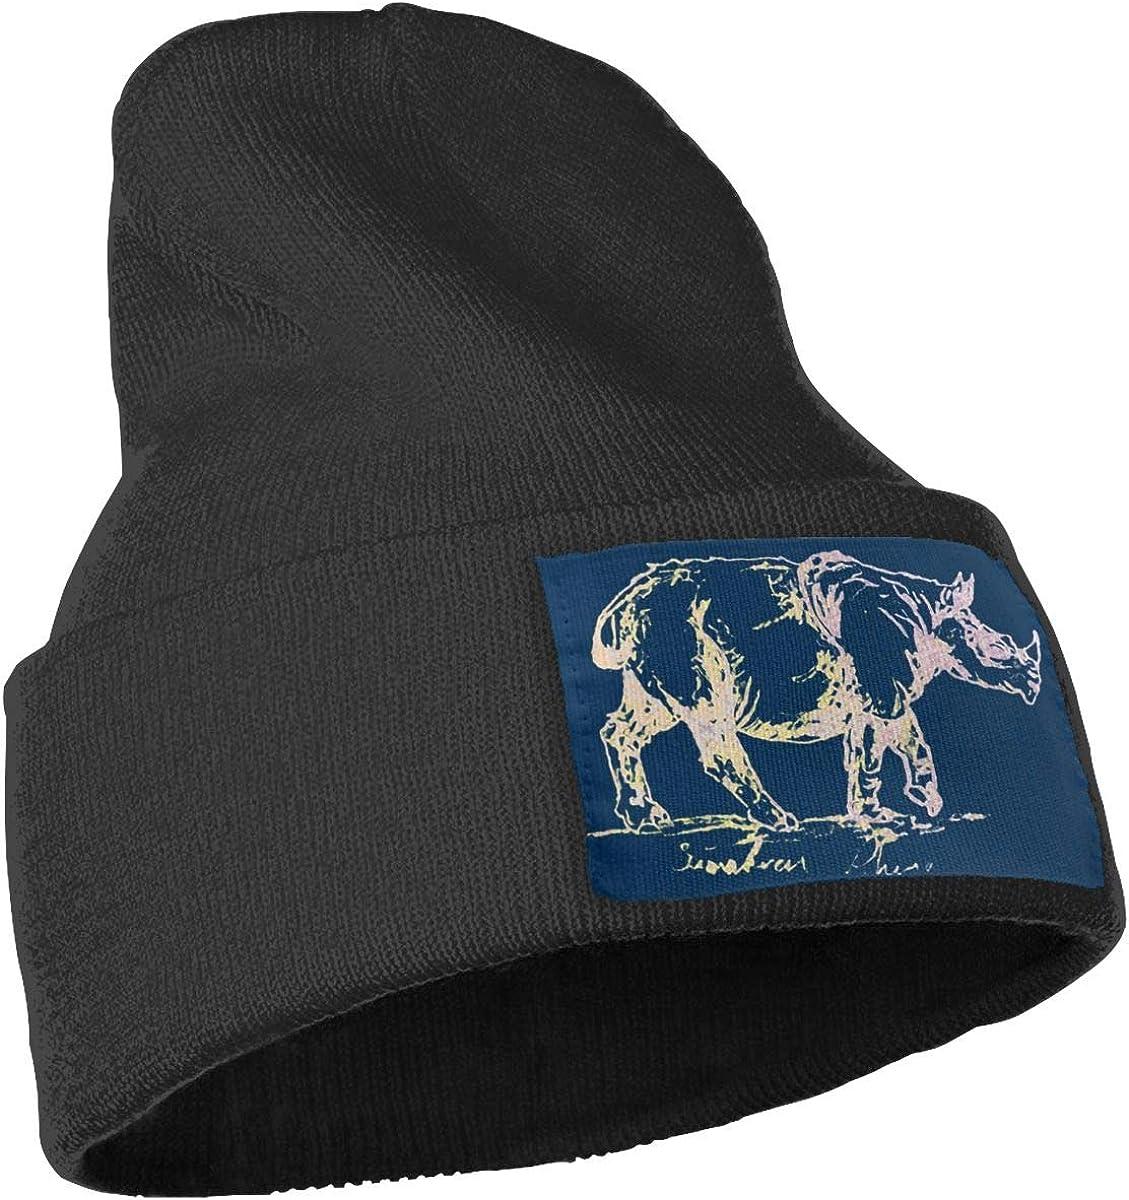 QZqDQ Sumatran Rhino Navy Unisex Fashion Knitted Hat Luxury Hip-Hop Cap